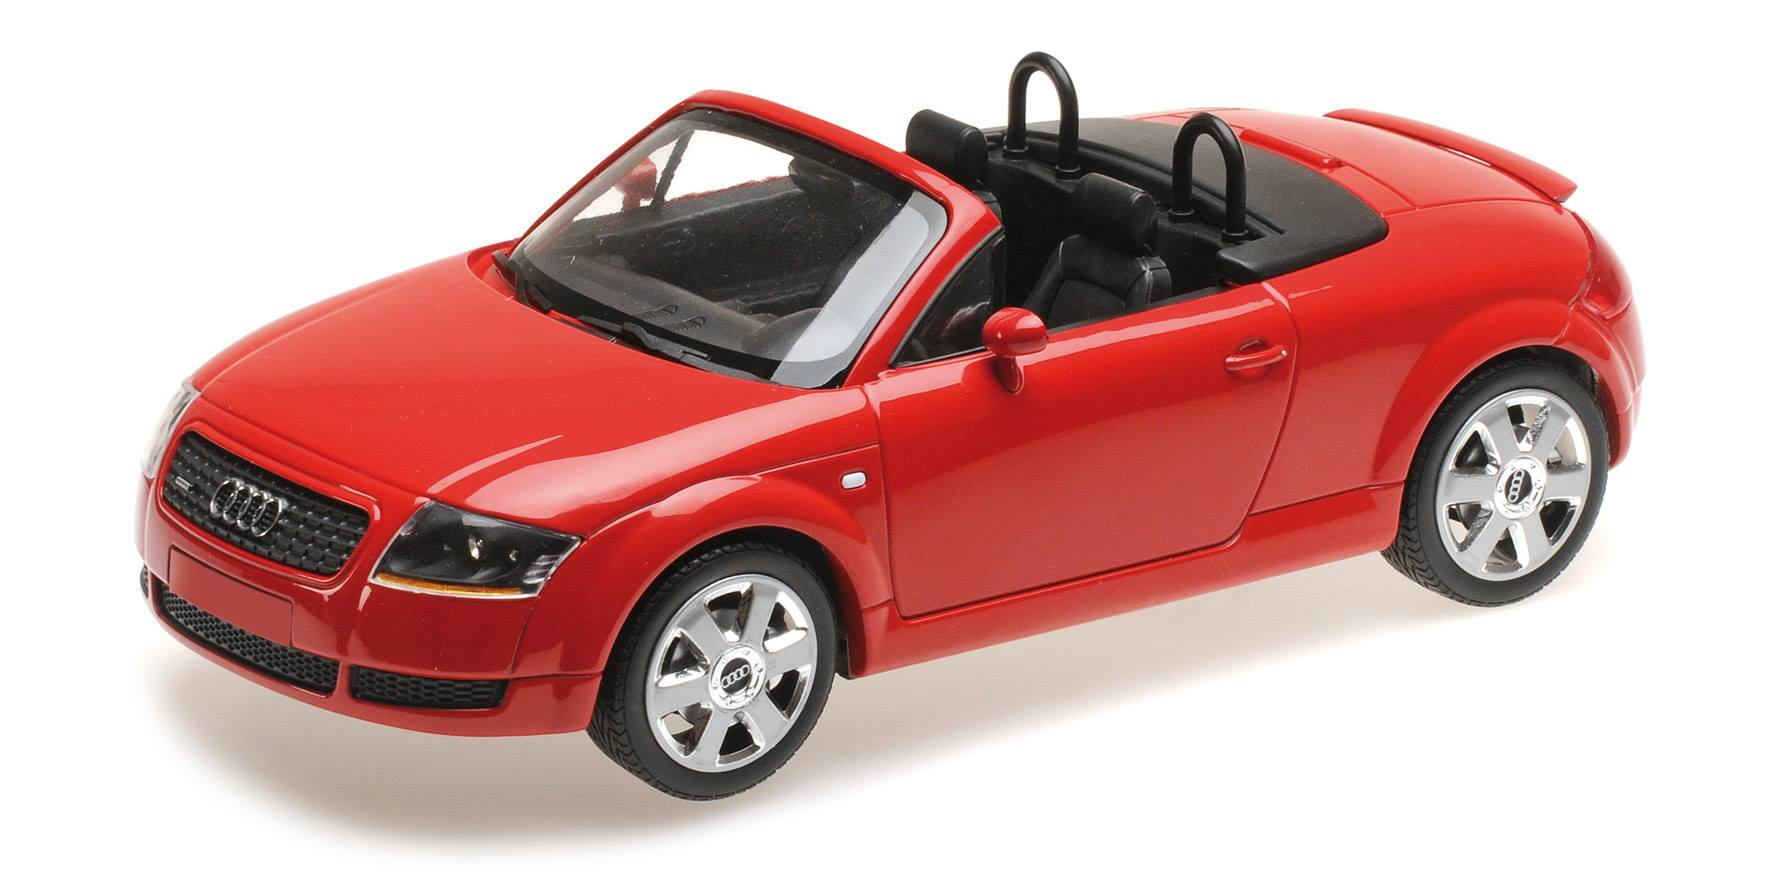 Audi Tt Roadster 1998 Red Minichamps 155017032 Minichamps